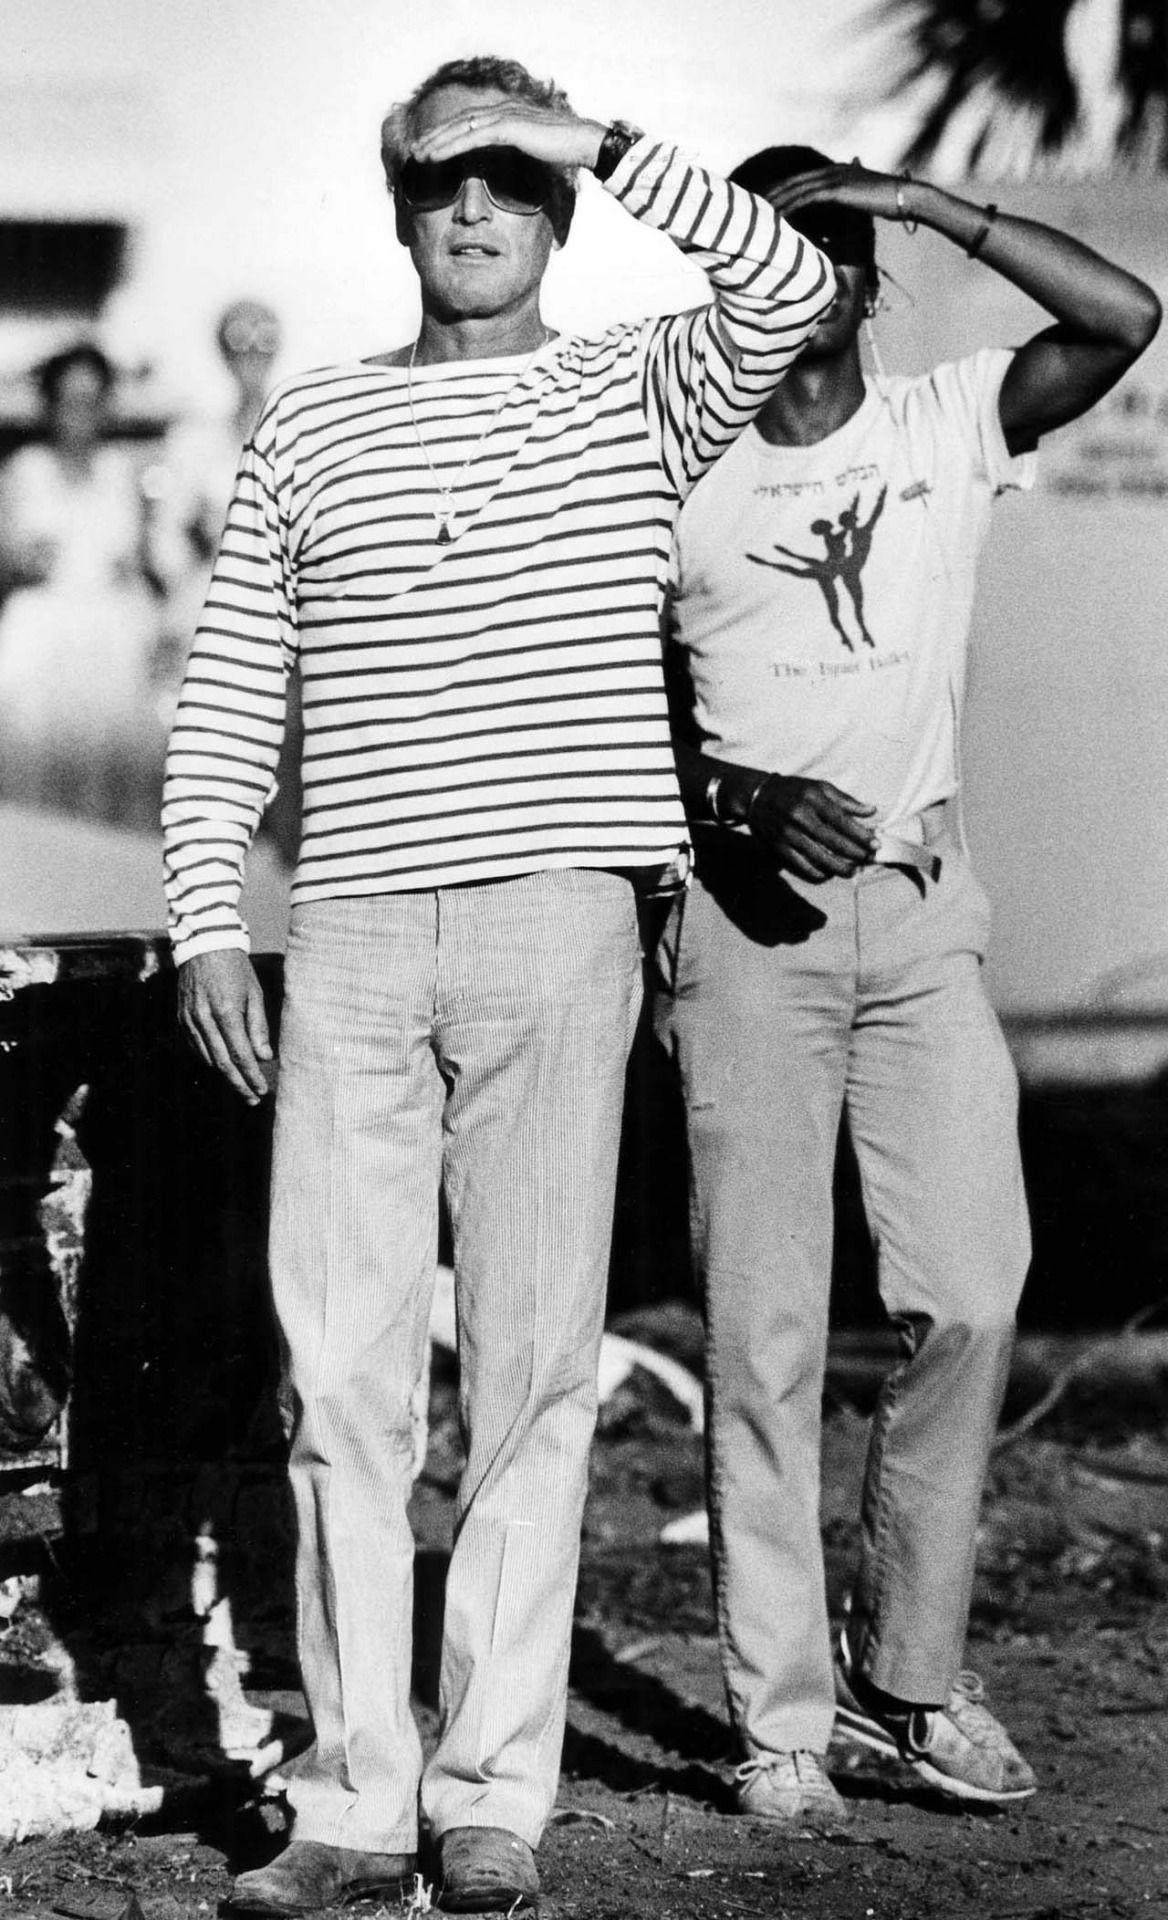 Paul Newman in stripes in 1983